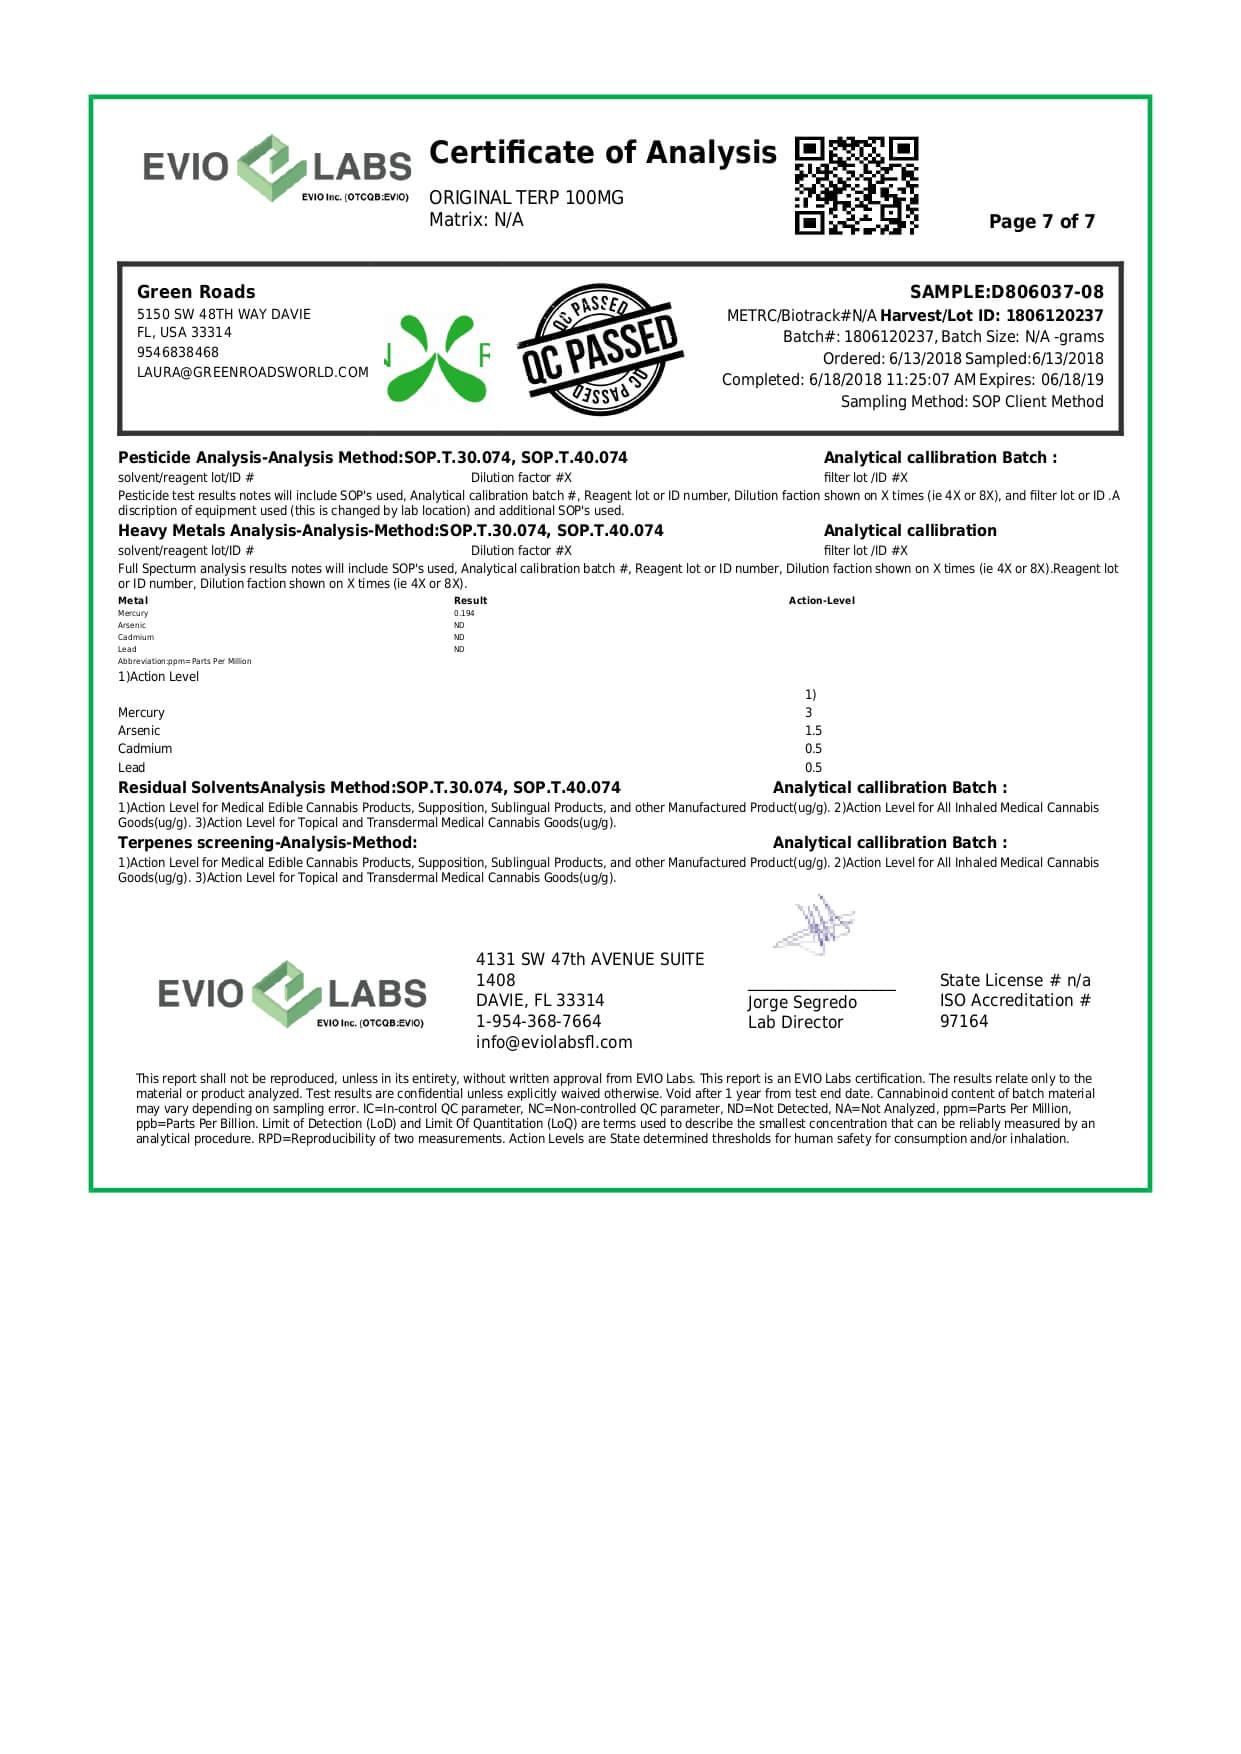 Green Roads CBD Terpenes Oil Original Nectar Lab Report